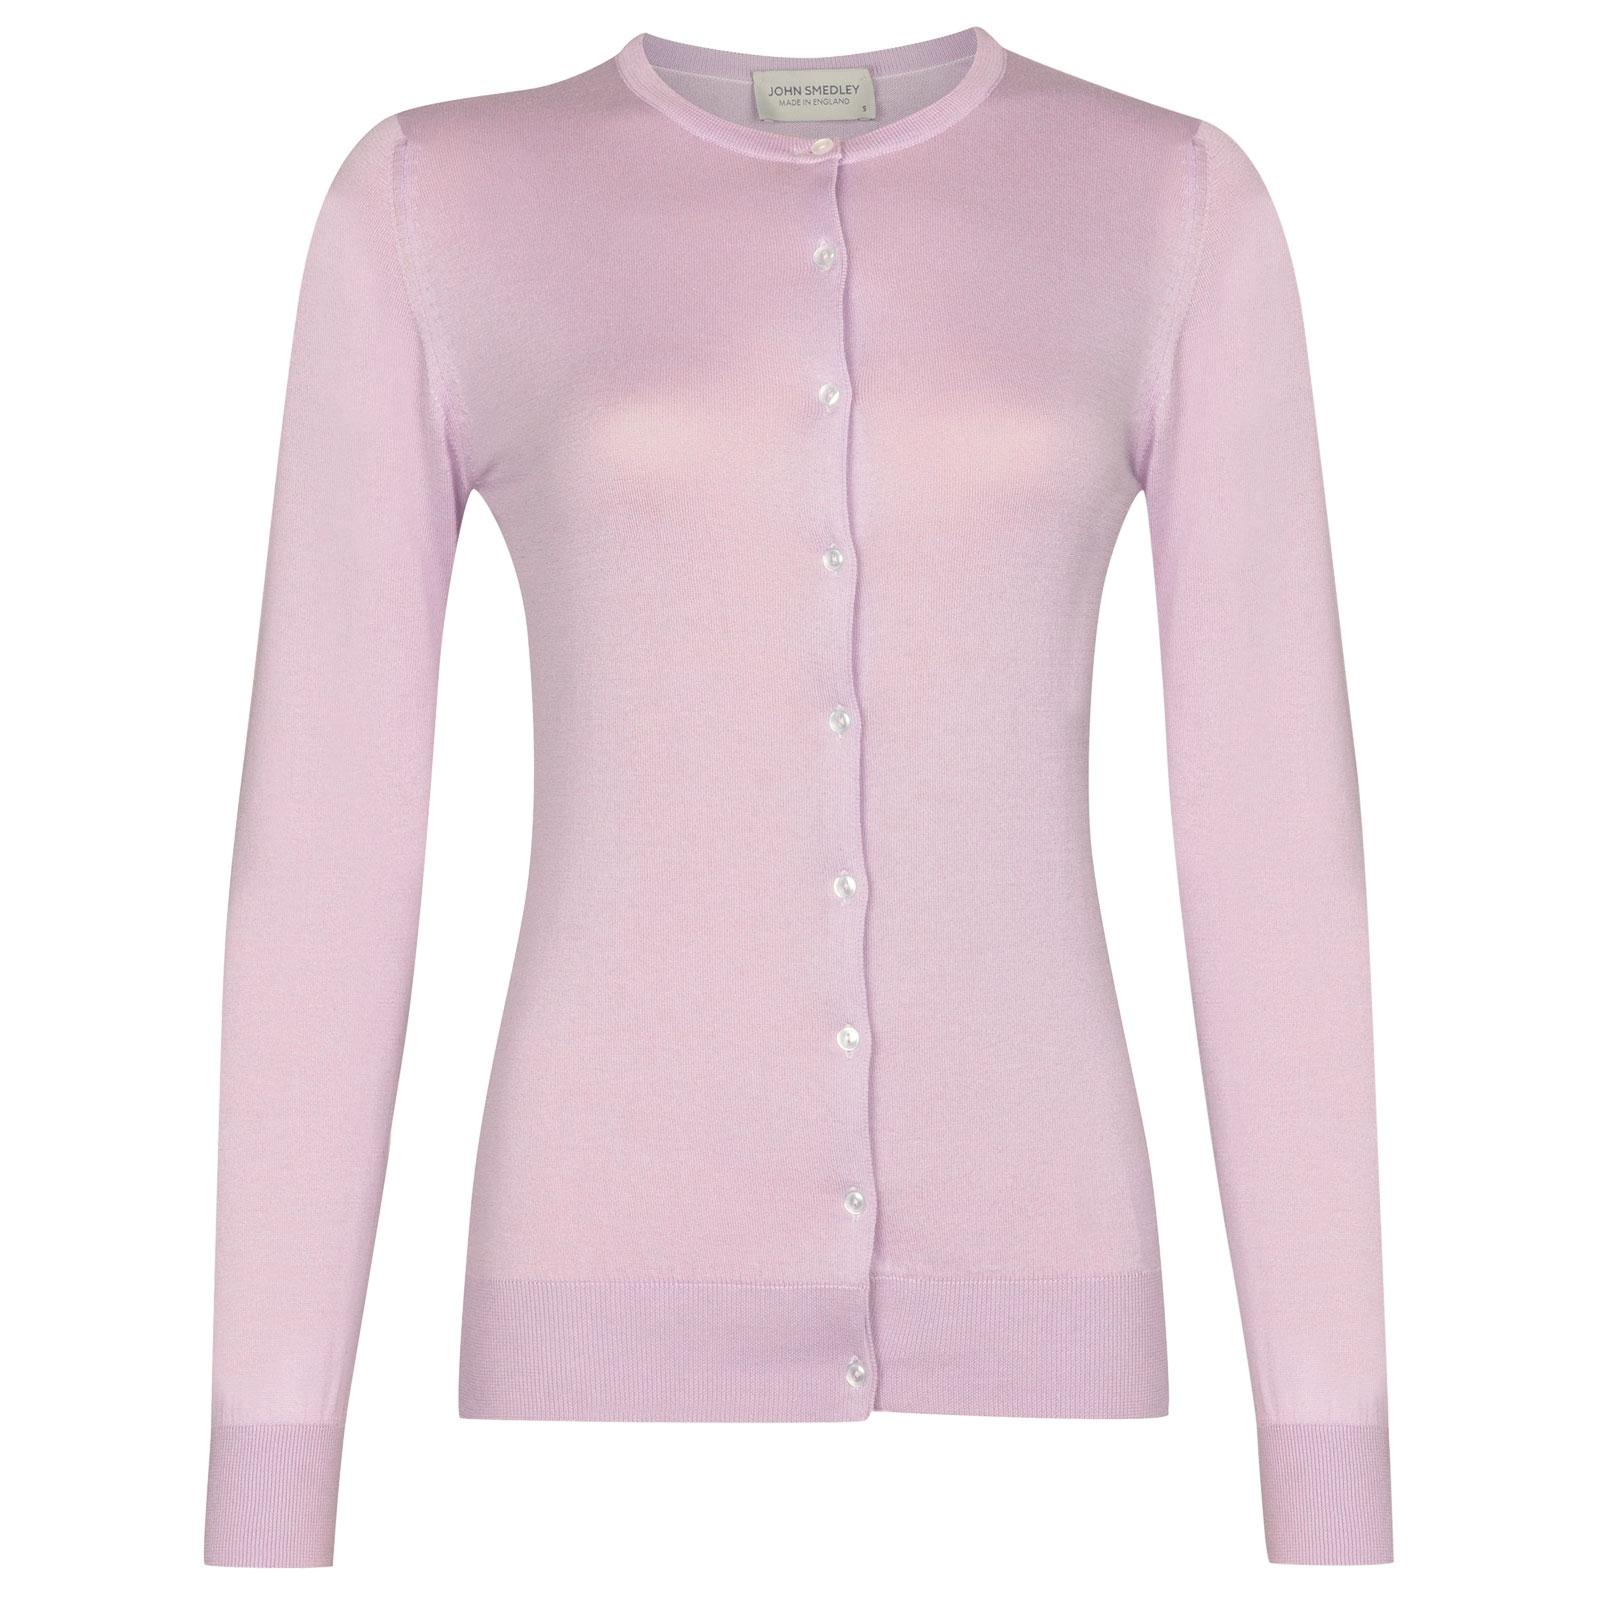 John Smedley Islington in Pink Blossom Cardigan-LGE